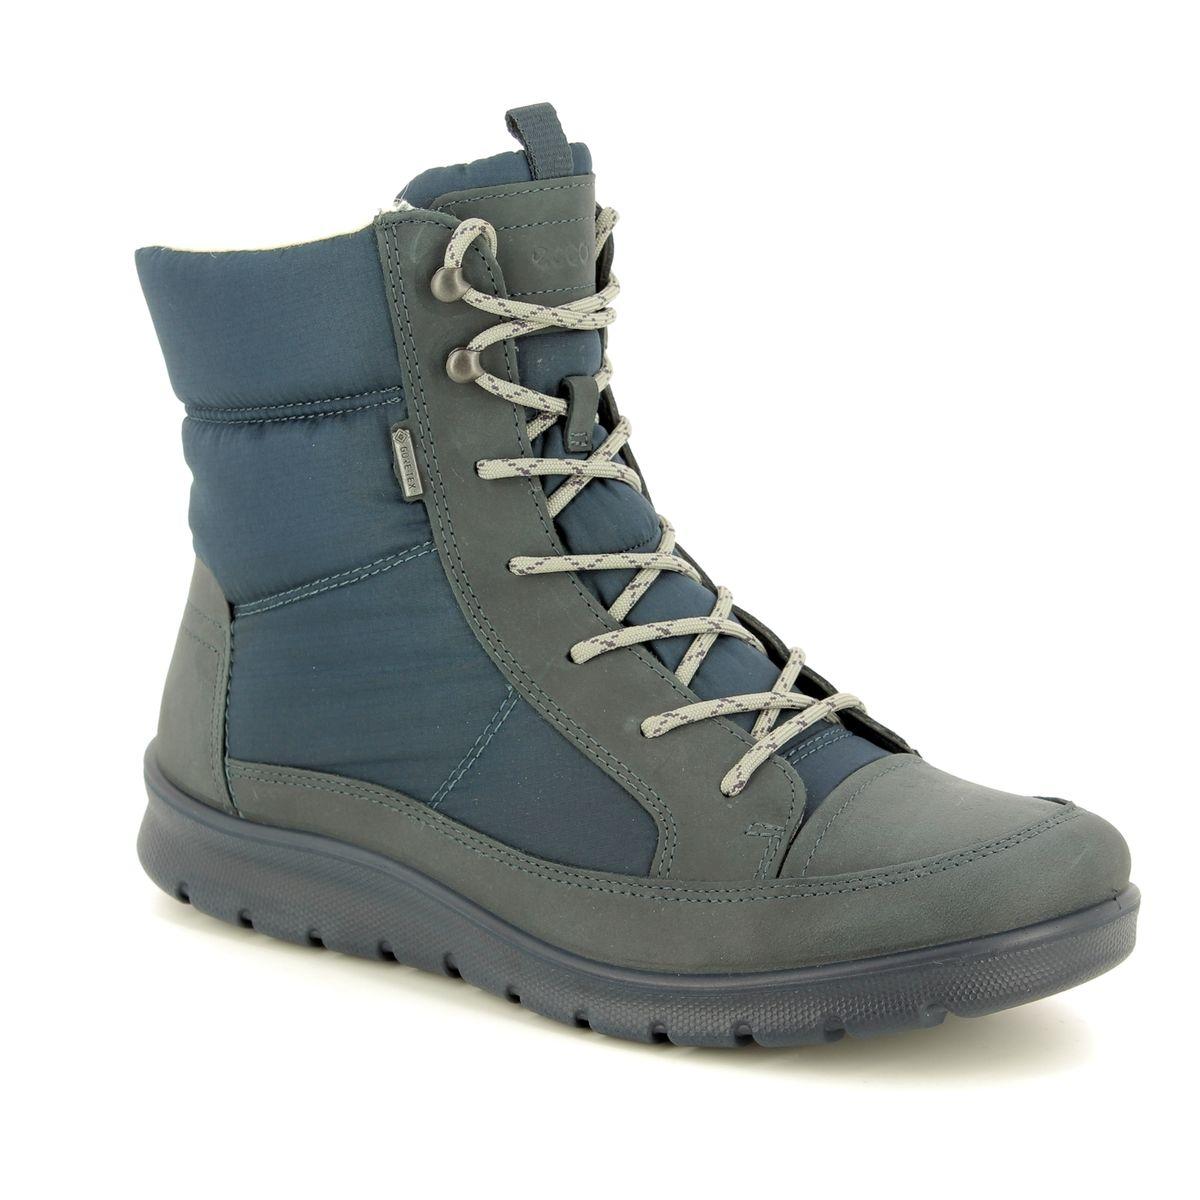 d4740f6d52a8 ECCO Winter Boots - Navy nubuck - 215553 50642 BABETT BOOT GORE-TEX 85